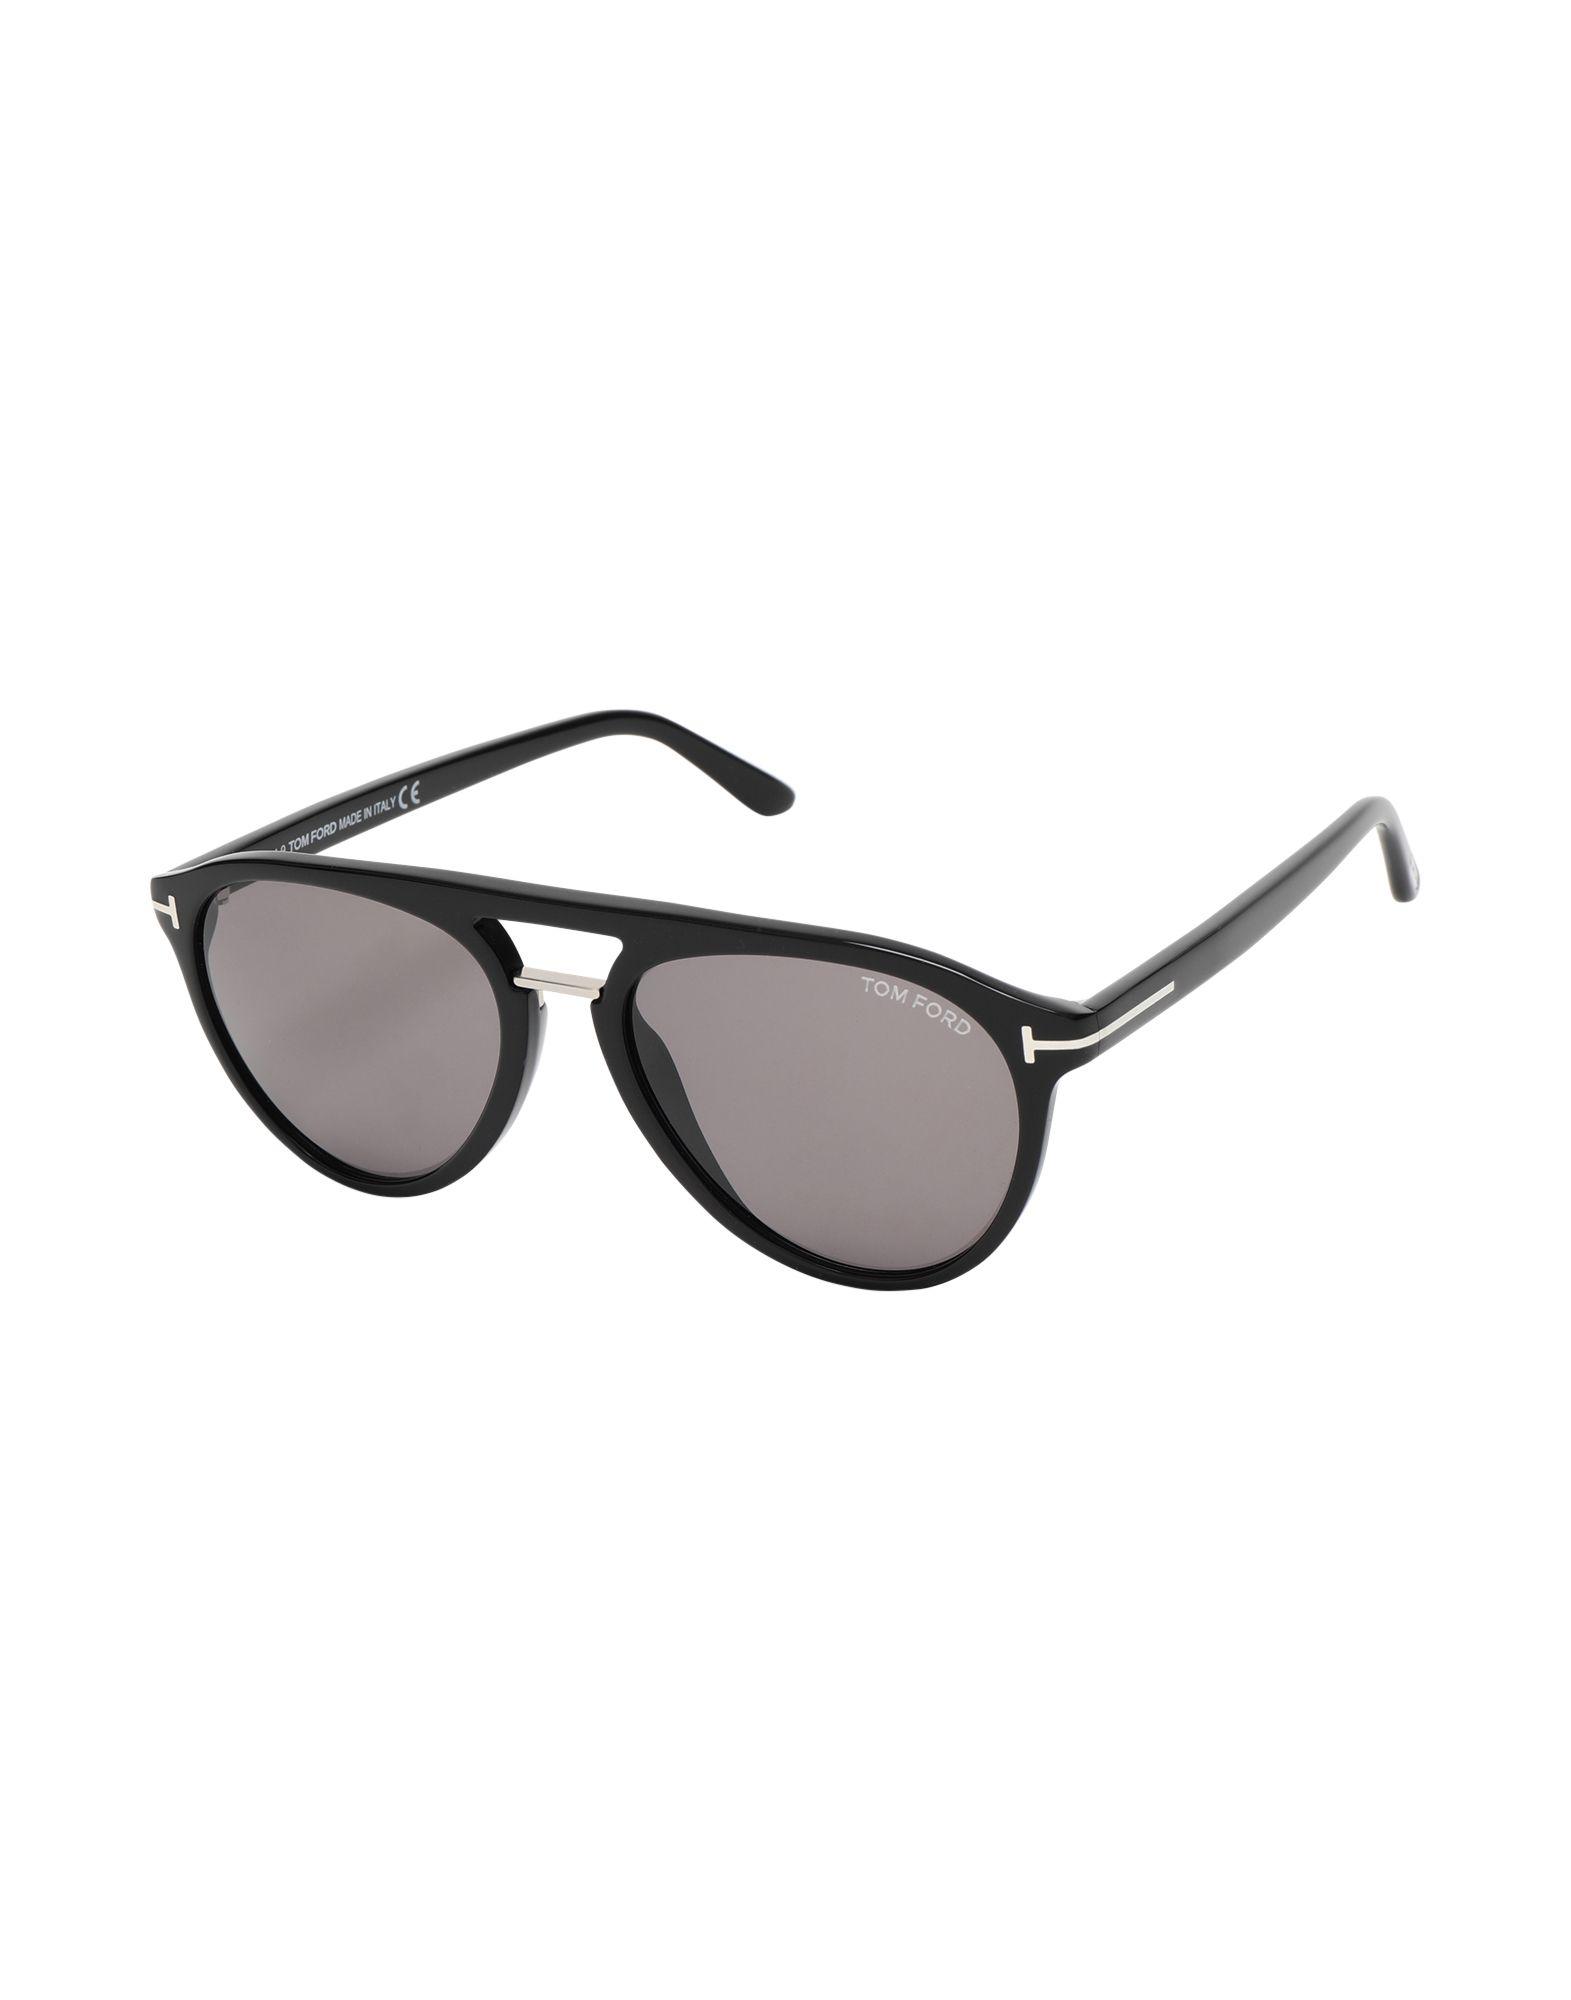 Фото - TOM FORD Солнечные очки 3d очки